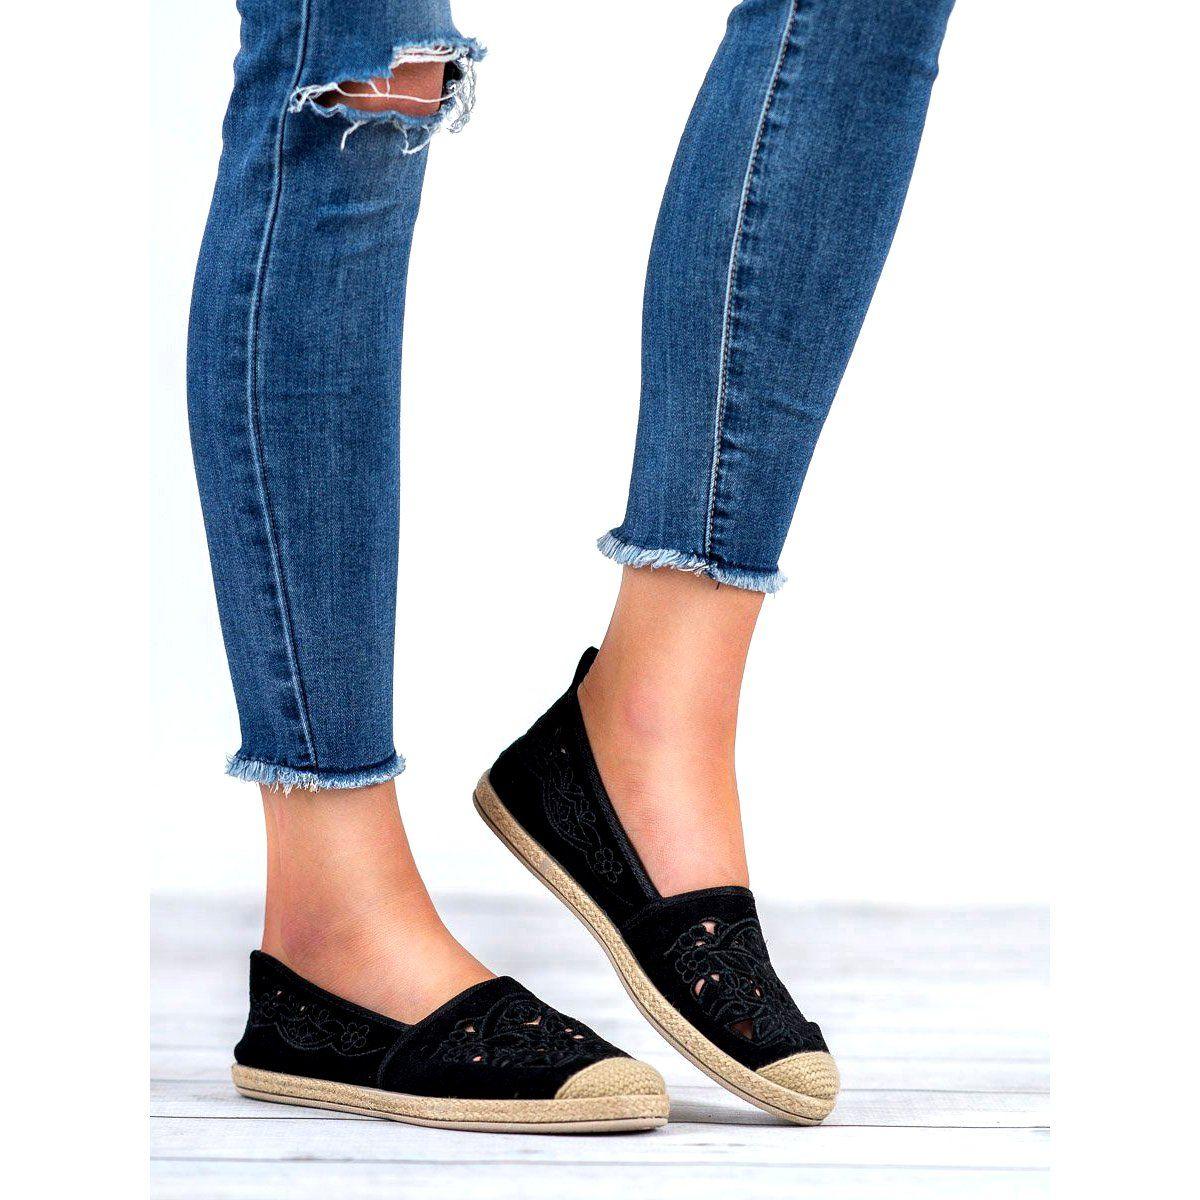 Zamszowe Espadryle Vices Czarne Flat Espadrille Espadrilles Shoes